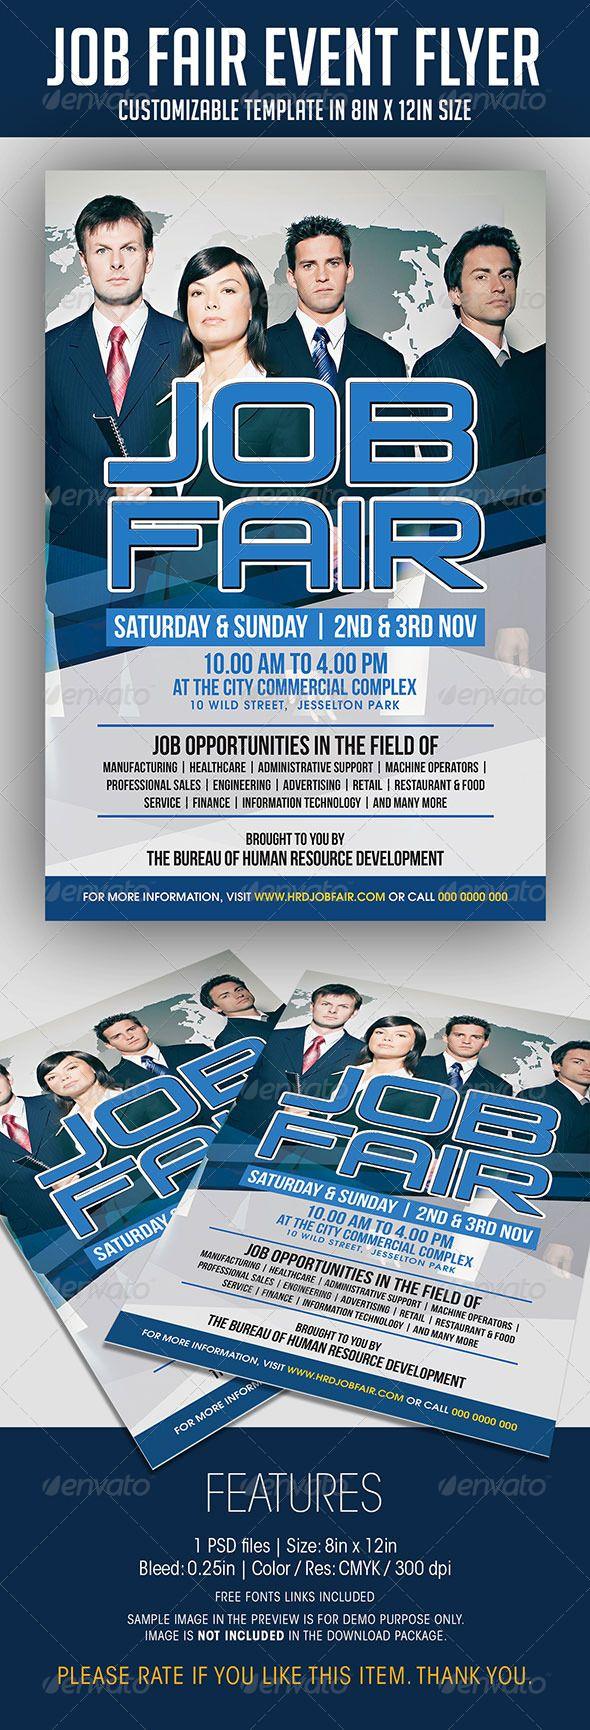 Banner design for job fair - Job Fair Event Flyer